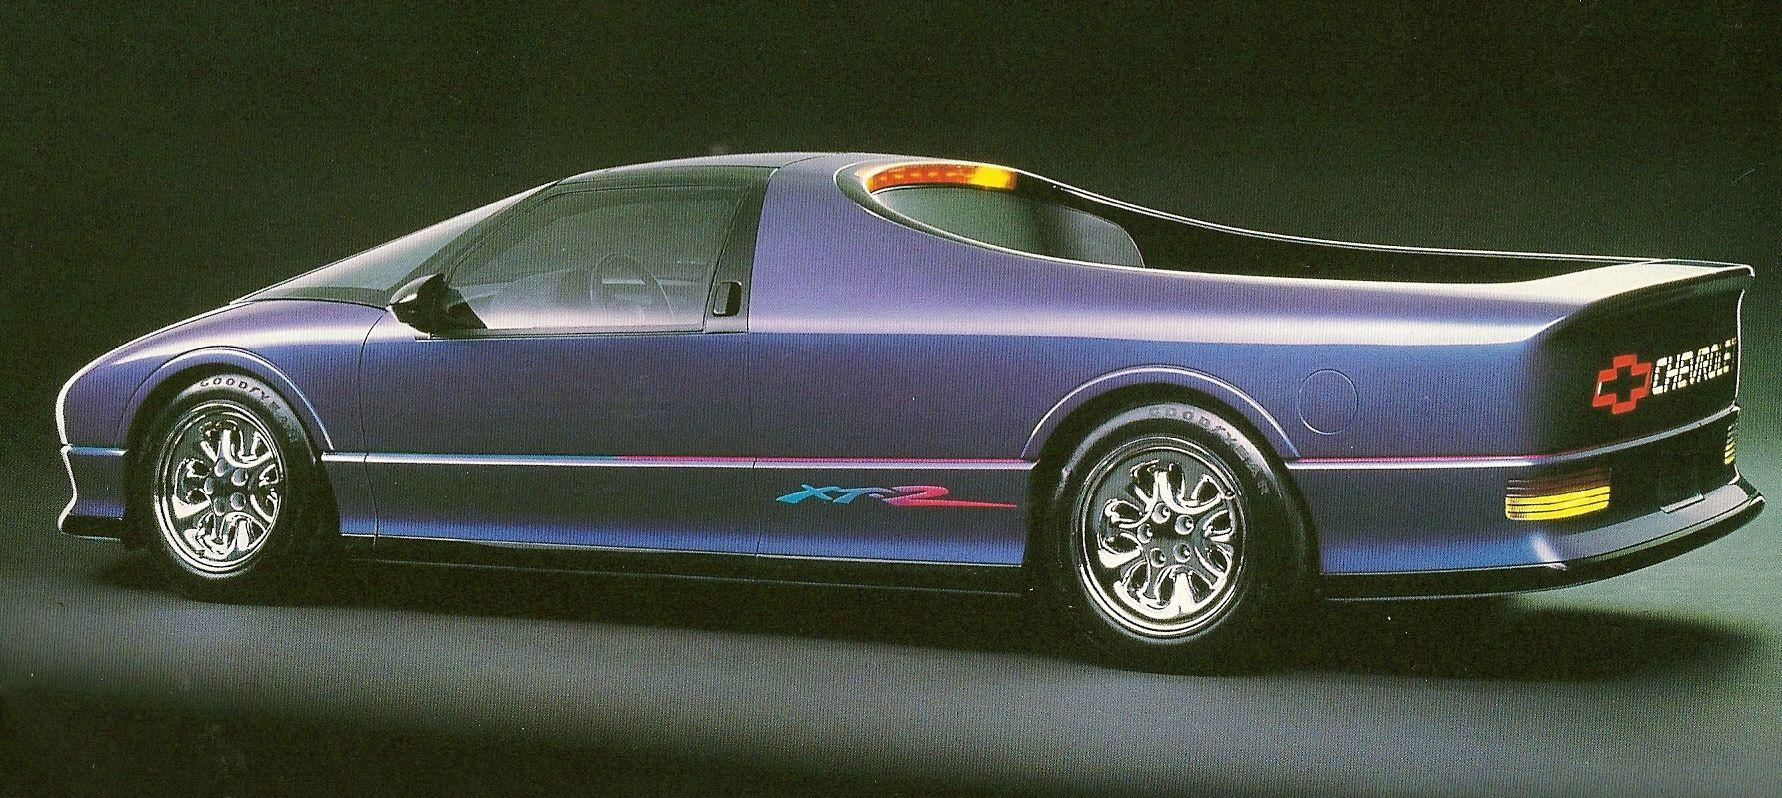 1989 Chevrolet XT-2 - Концепты #conceptcars